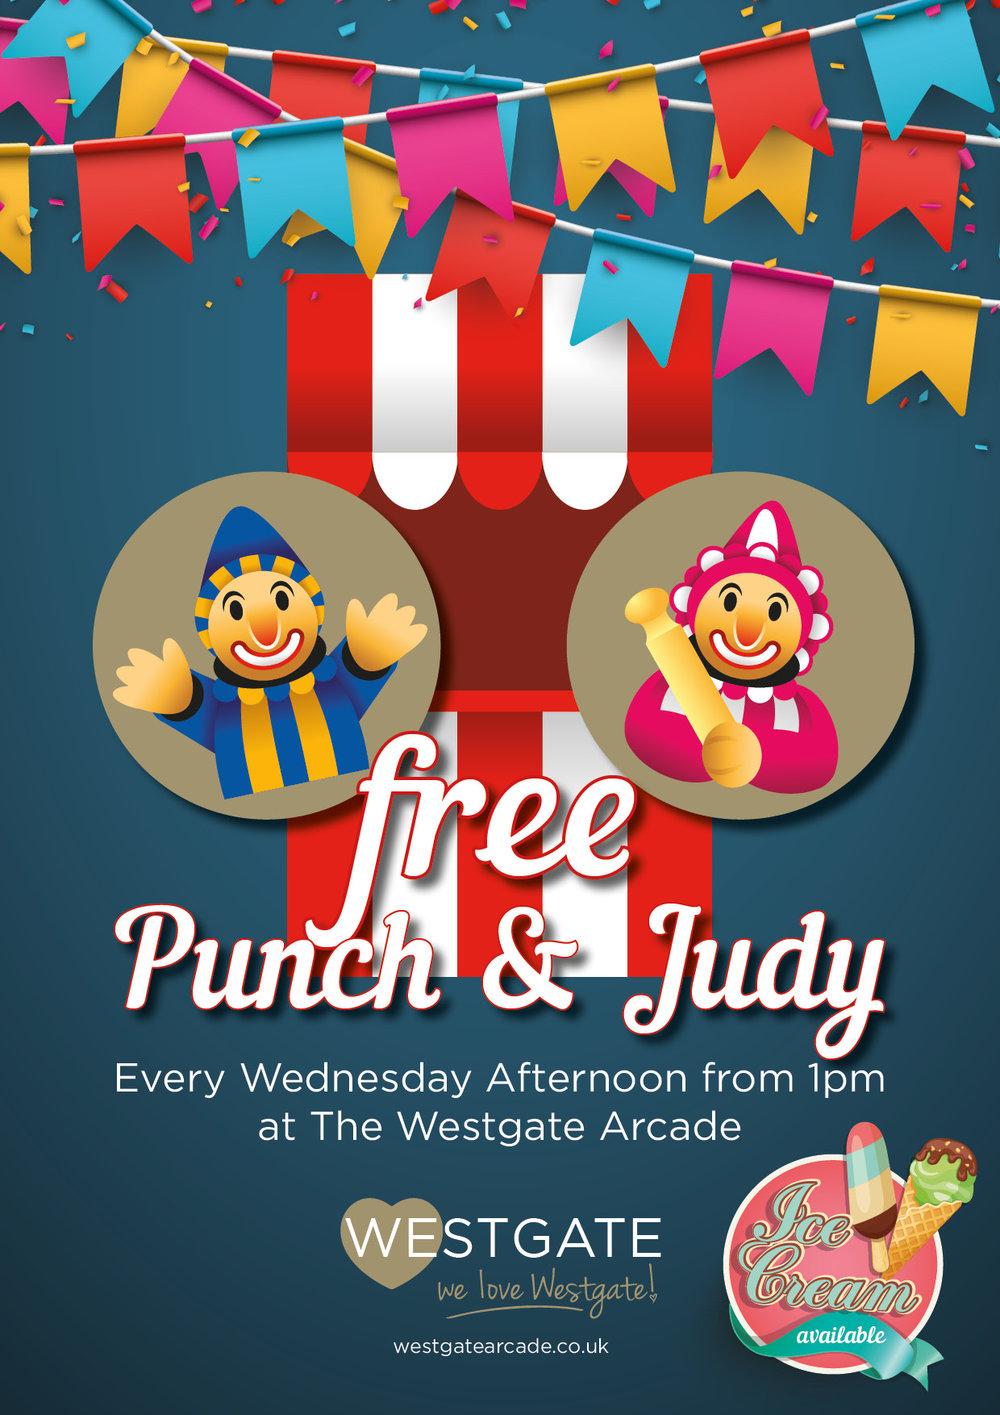 414_punch_&_judy_poster.jpg